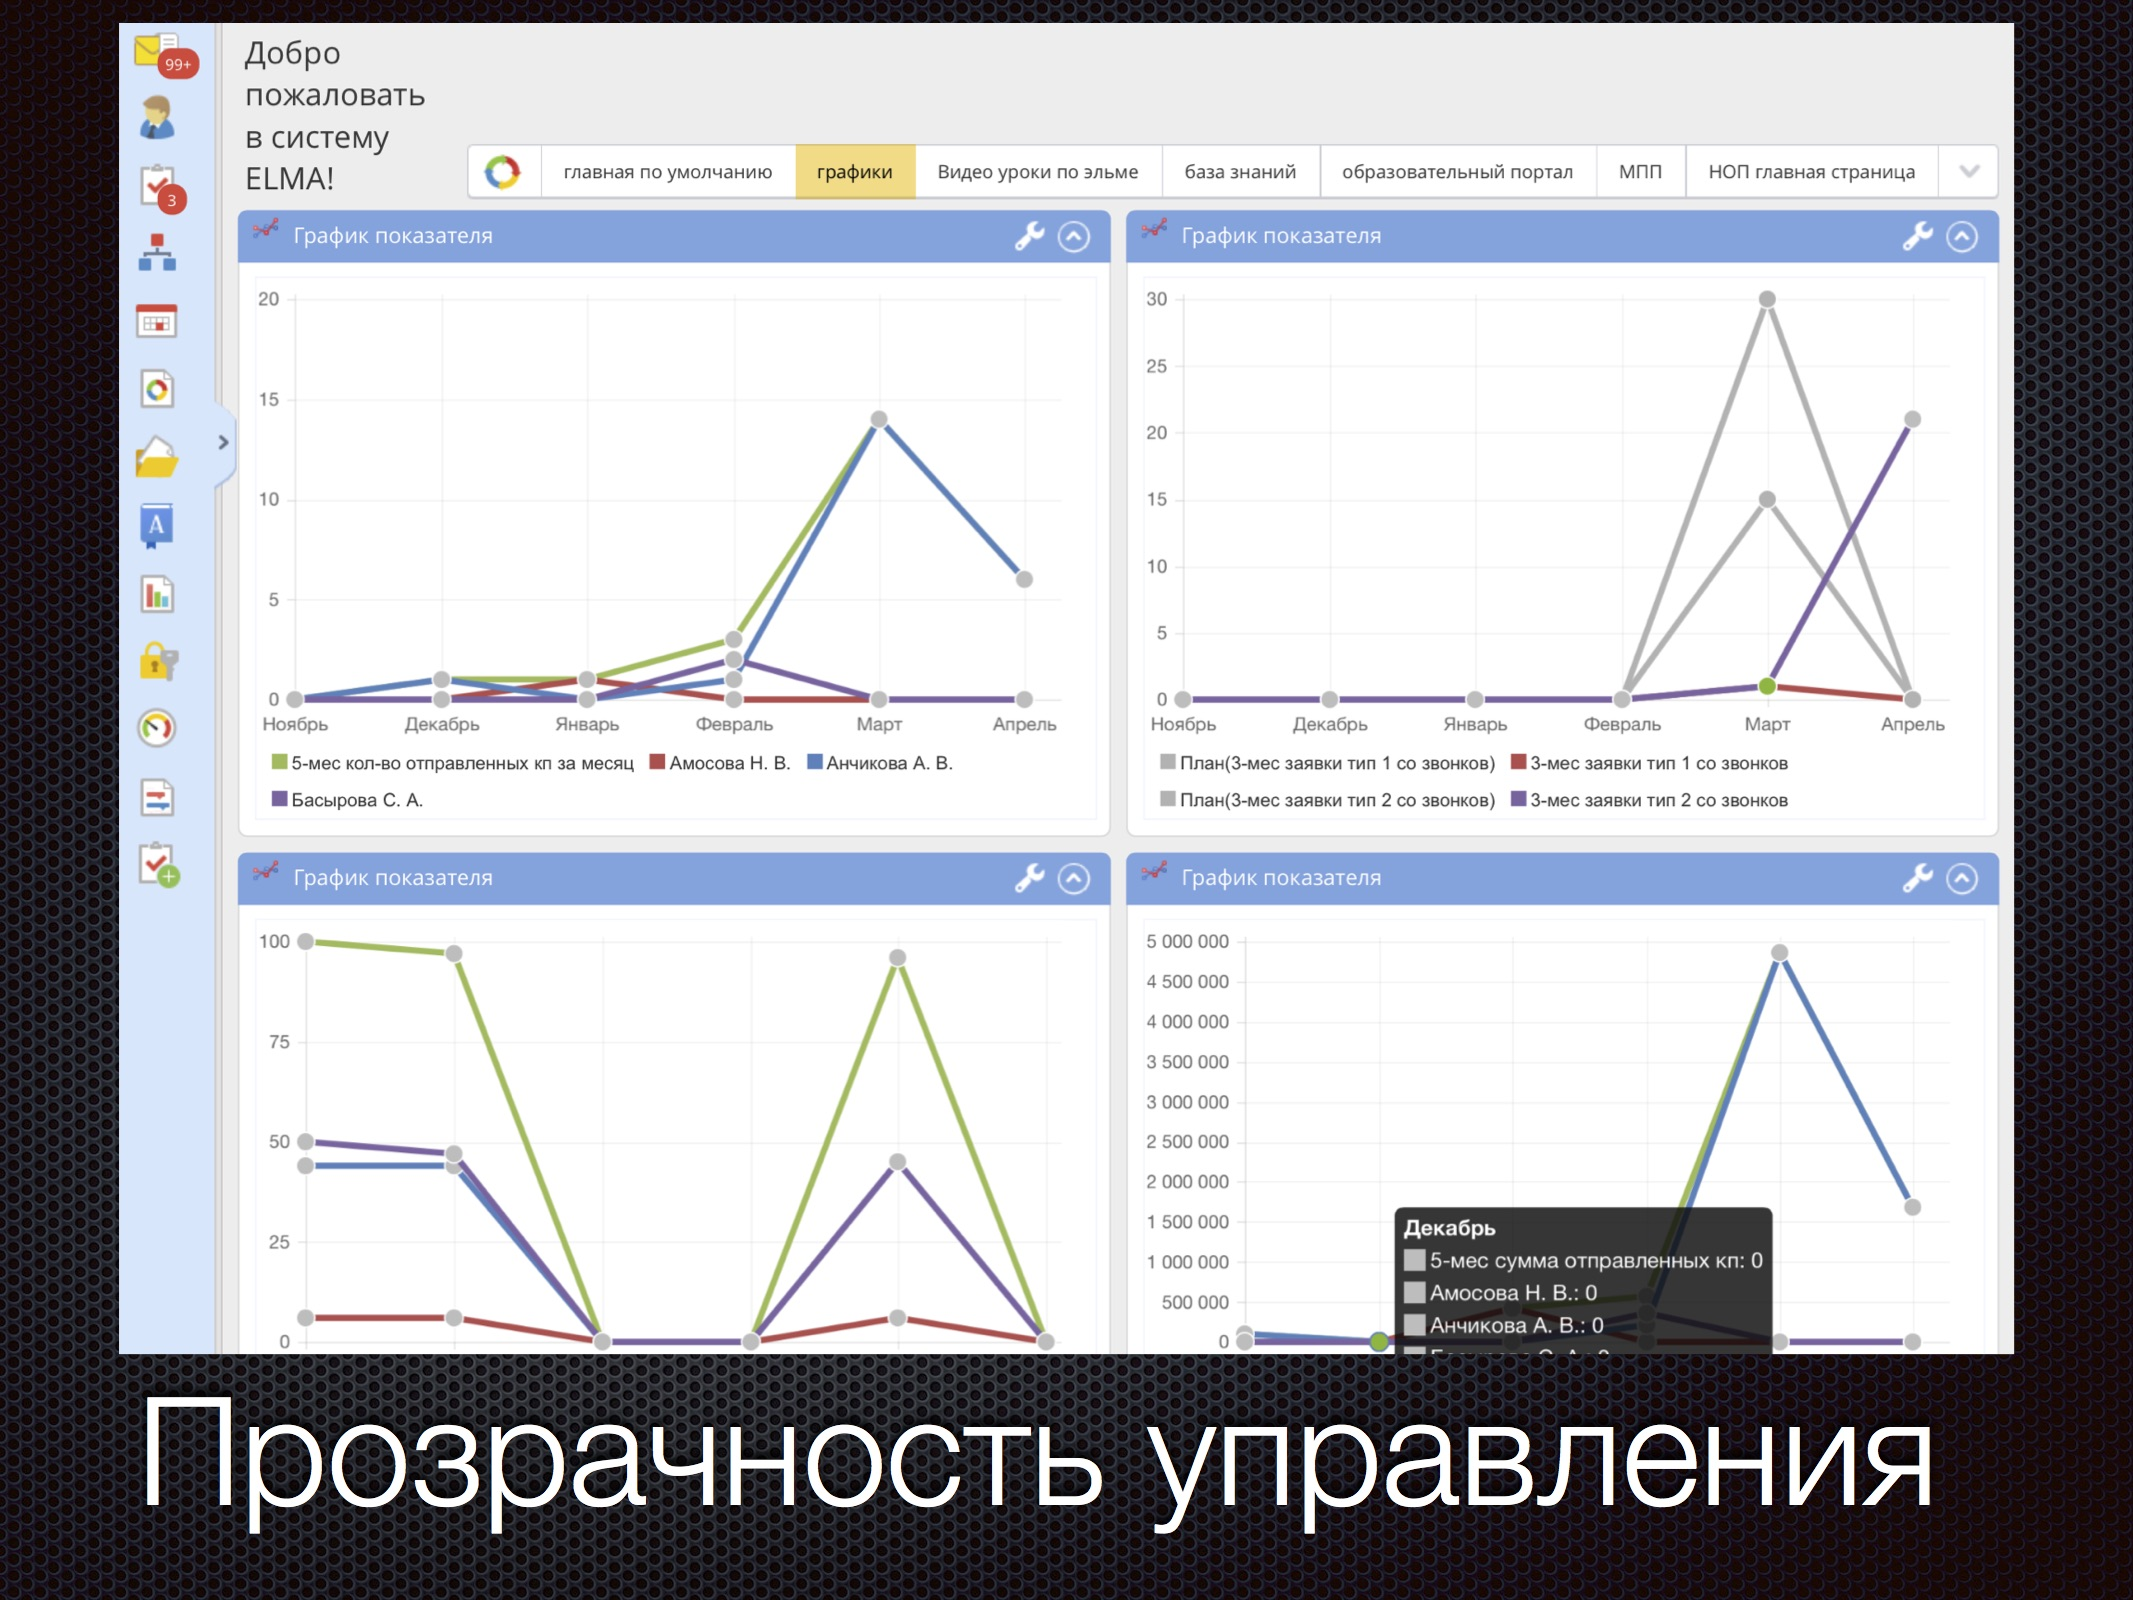 Визуализация показателей